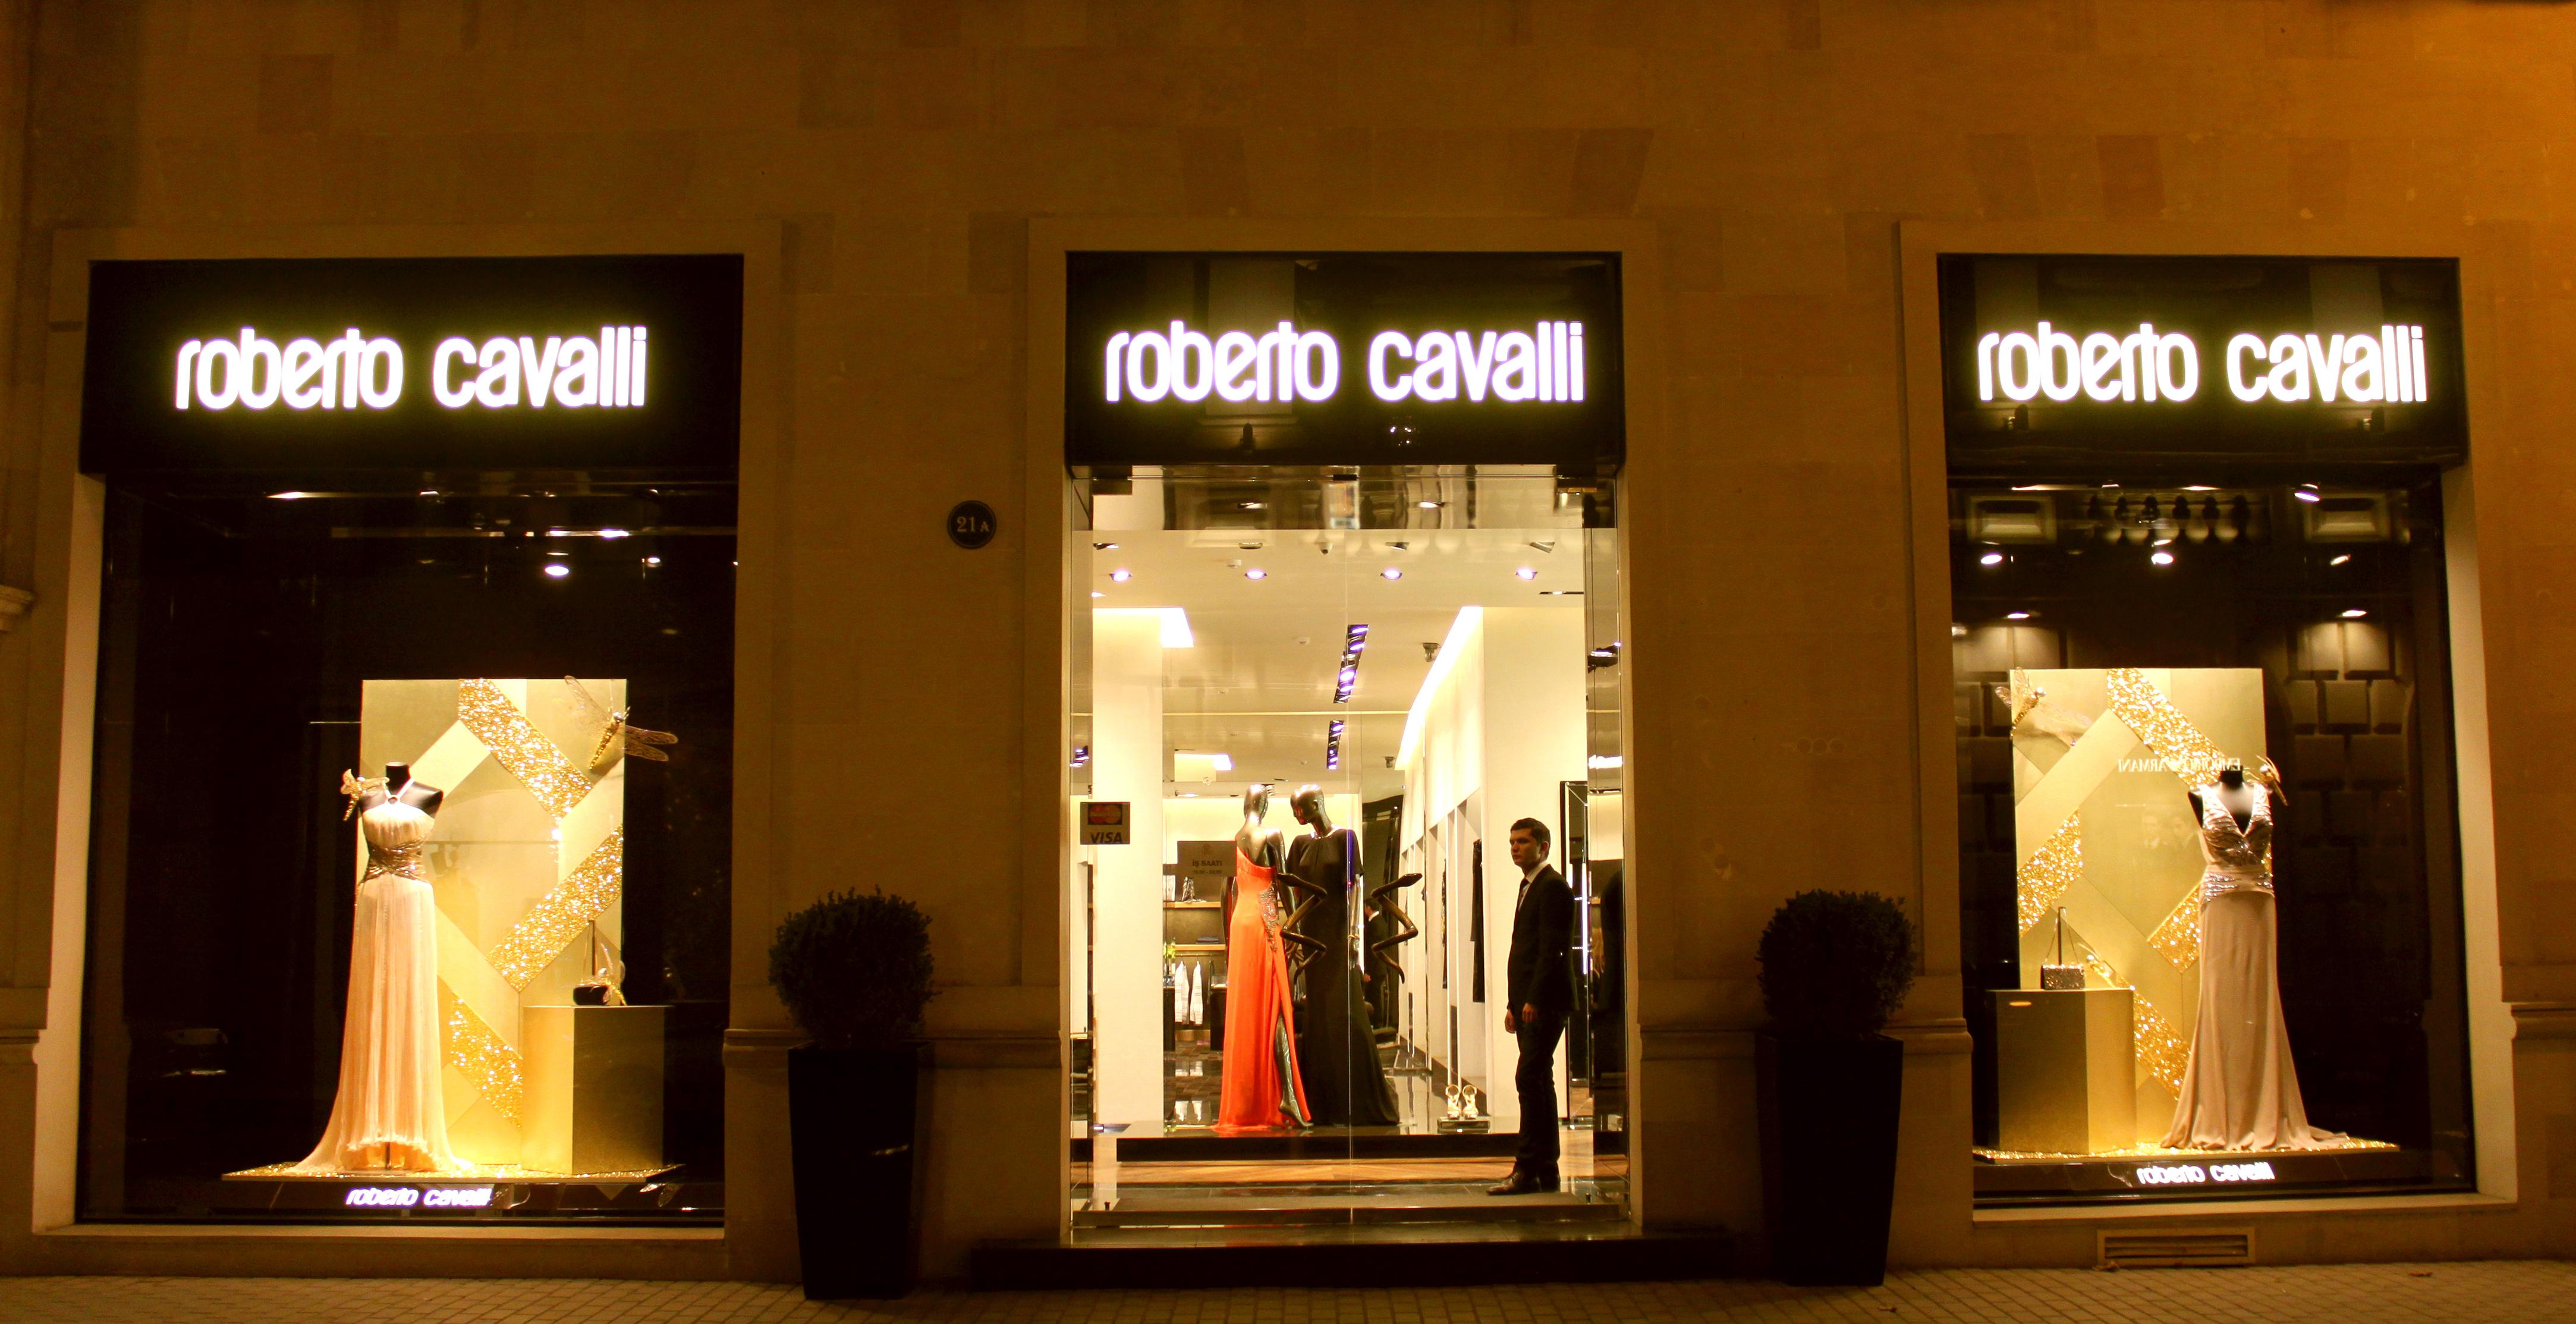 File:Roberto Cavalli boutique in Baku.JPG